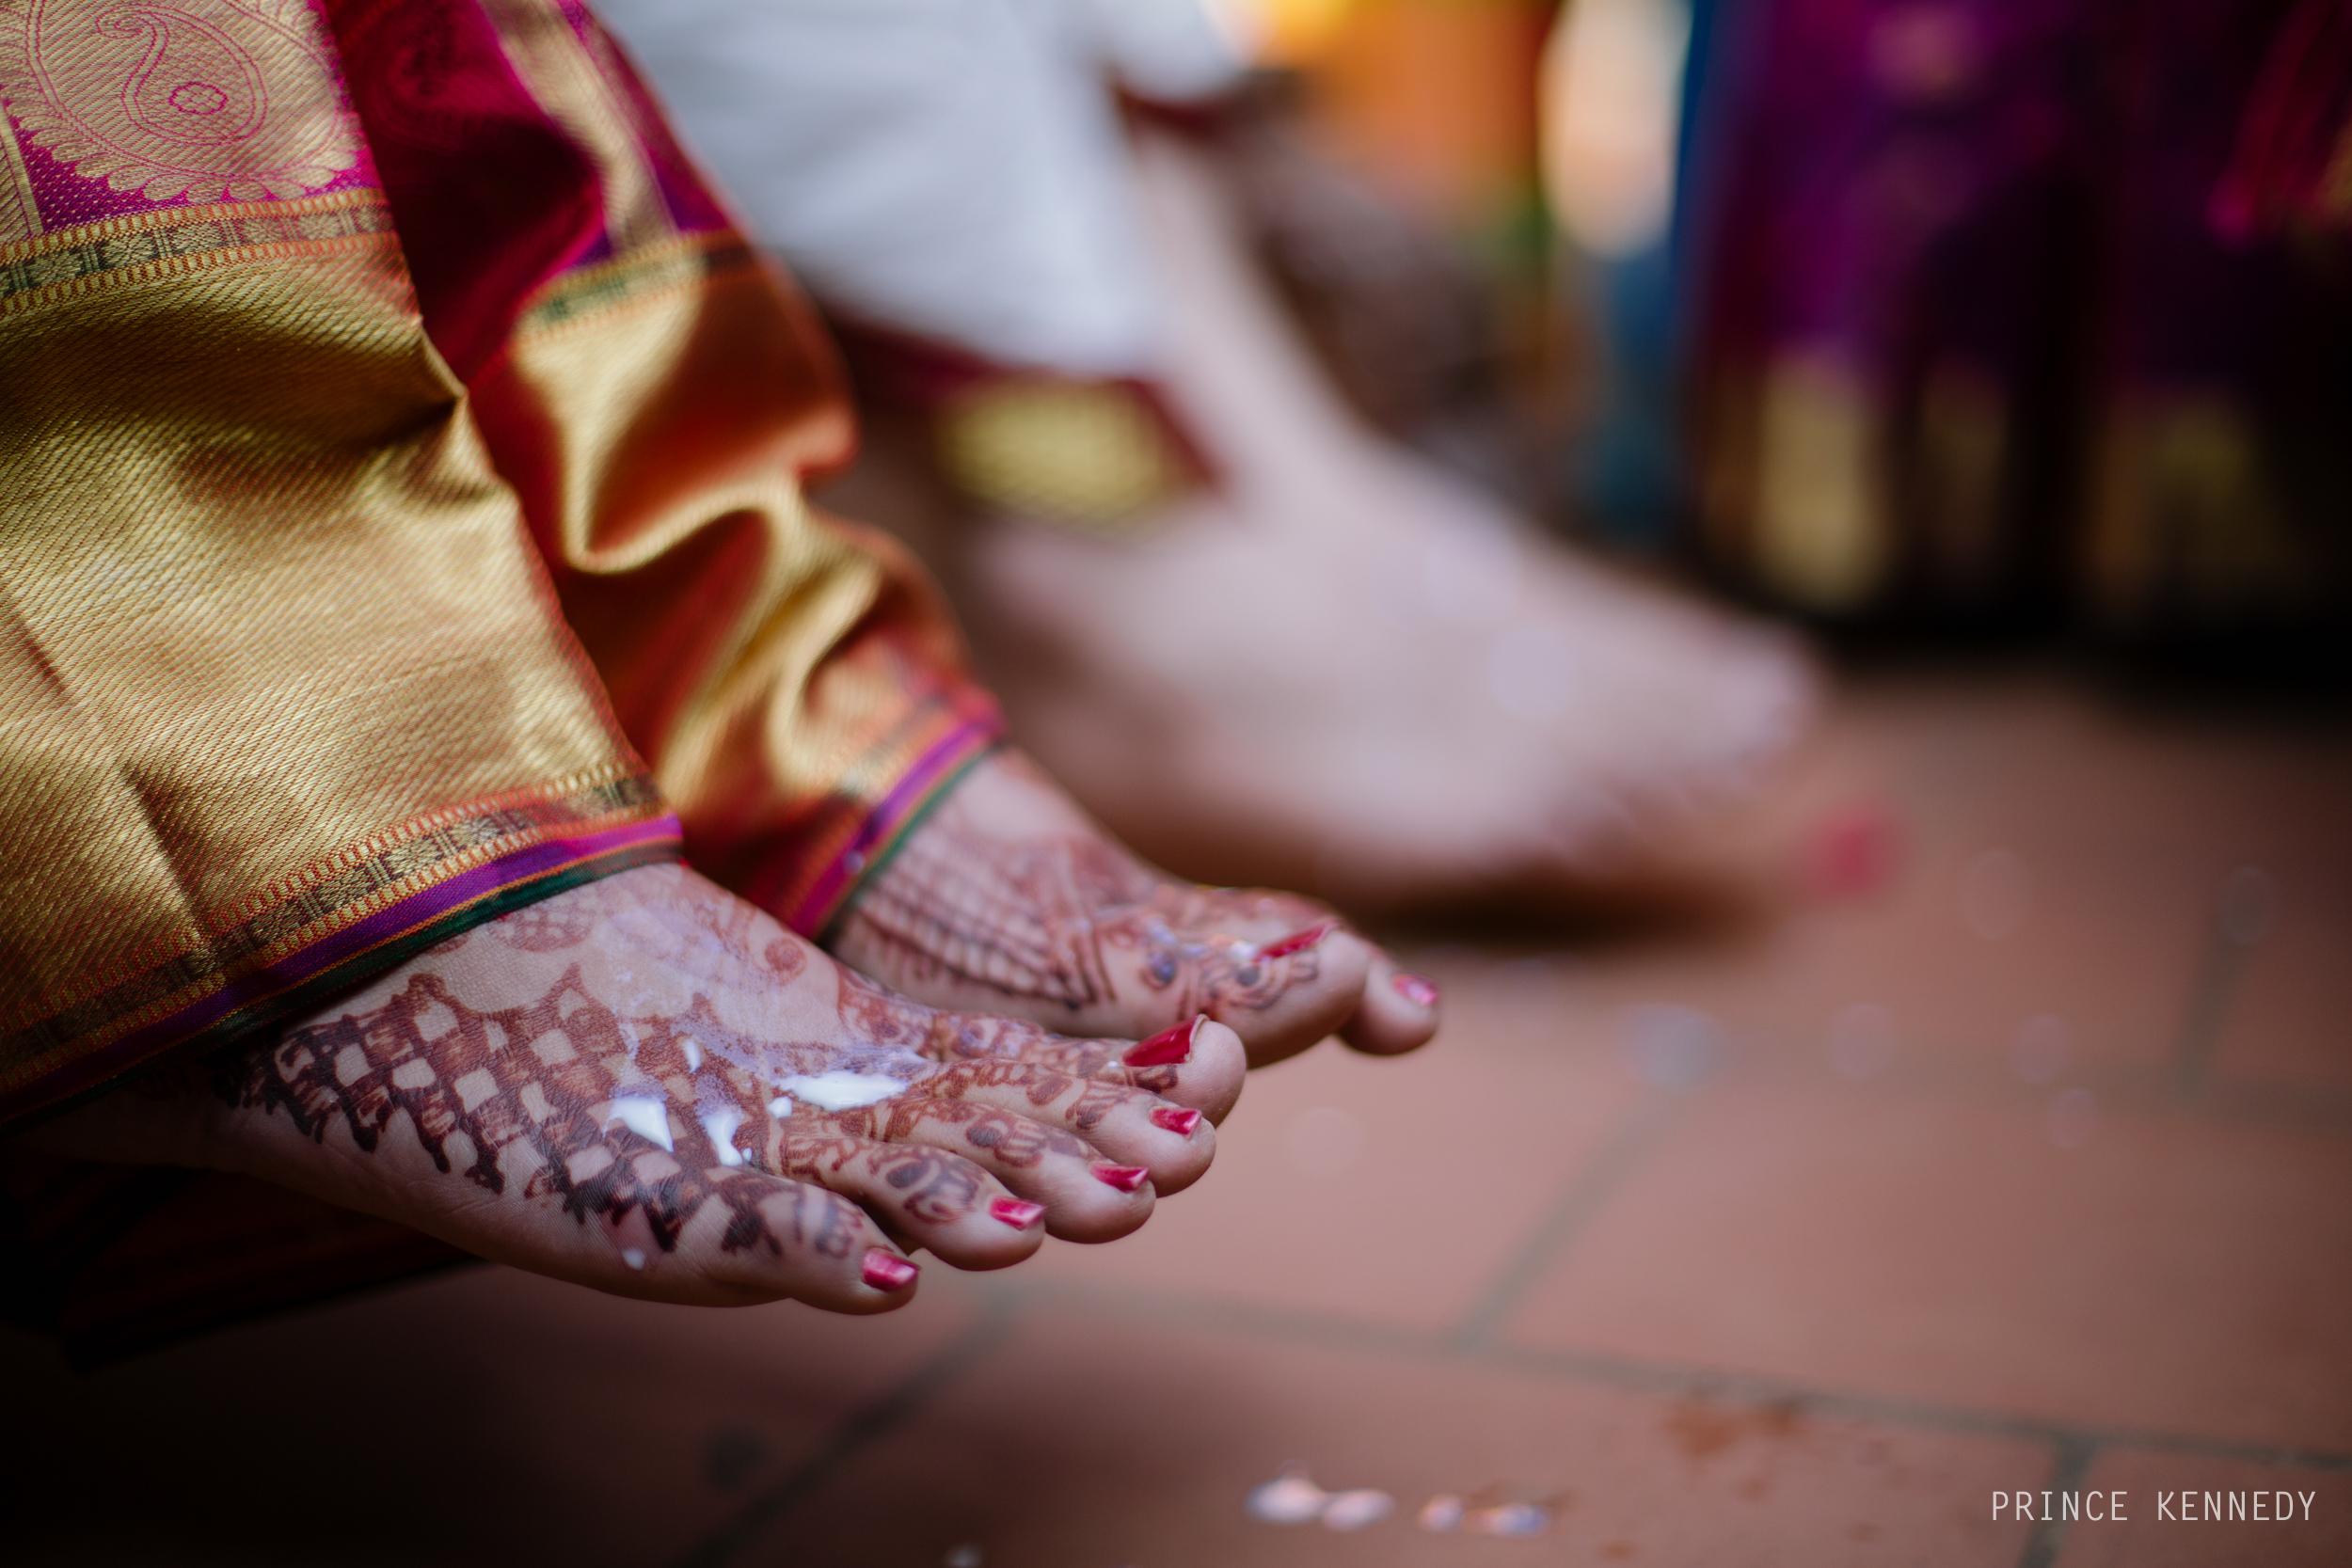 Athmajja-Nithesh-Engagement-Couple-Portrait-Portraiture-Wedding-Couple-Portrait-Chennai-Photographer-Candid-Photography-Destination-Best-Prince-Kennedy-Photography-136.jpg